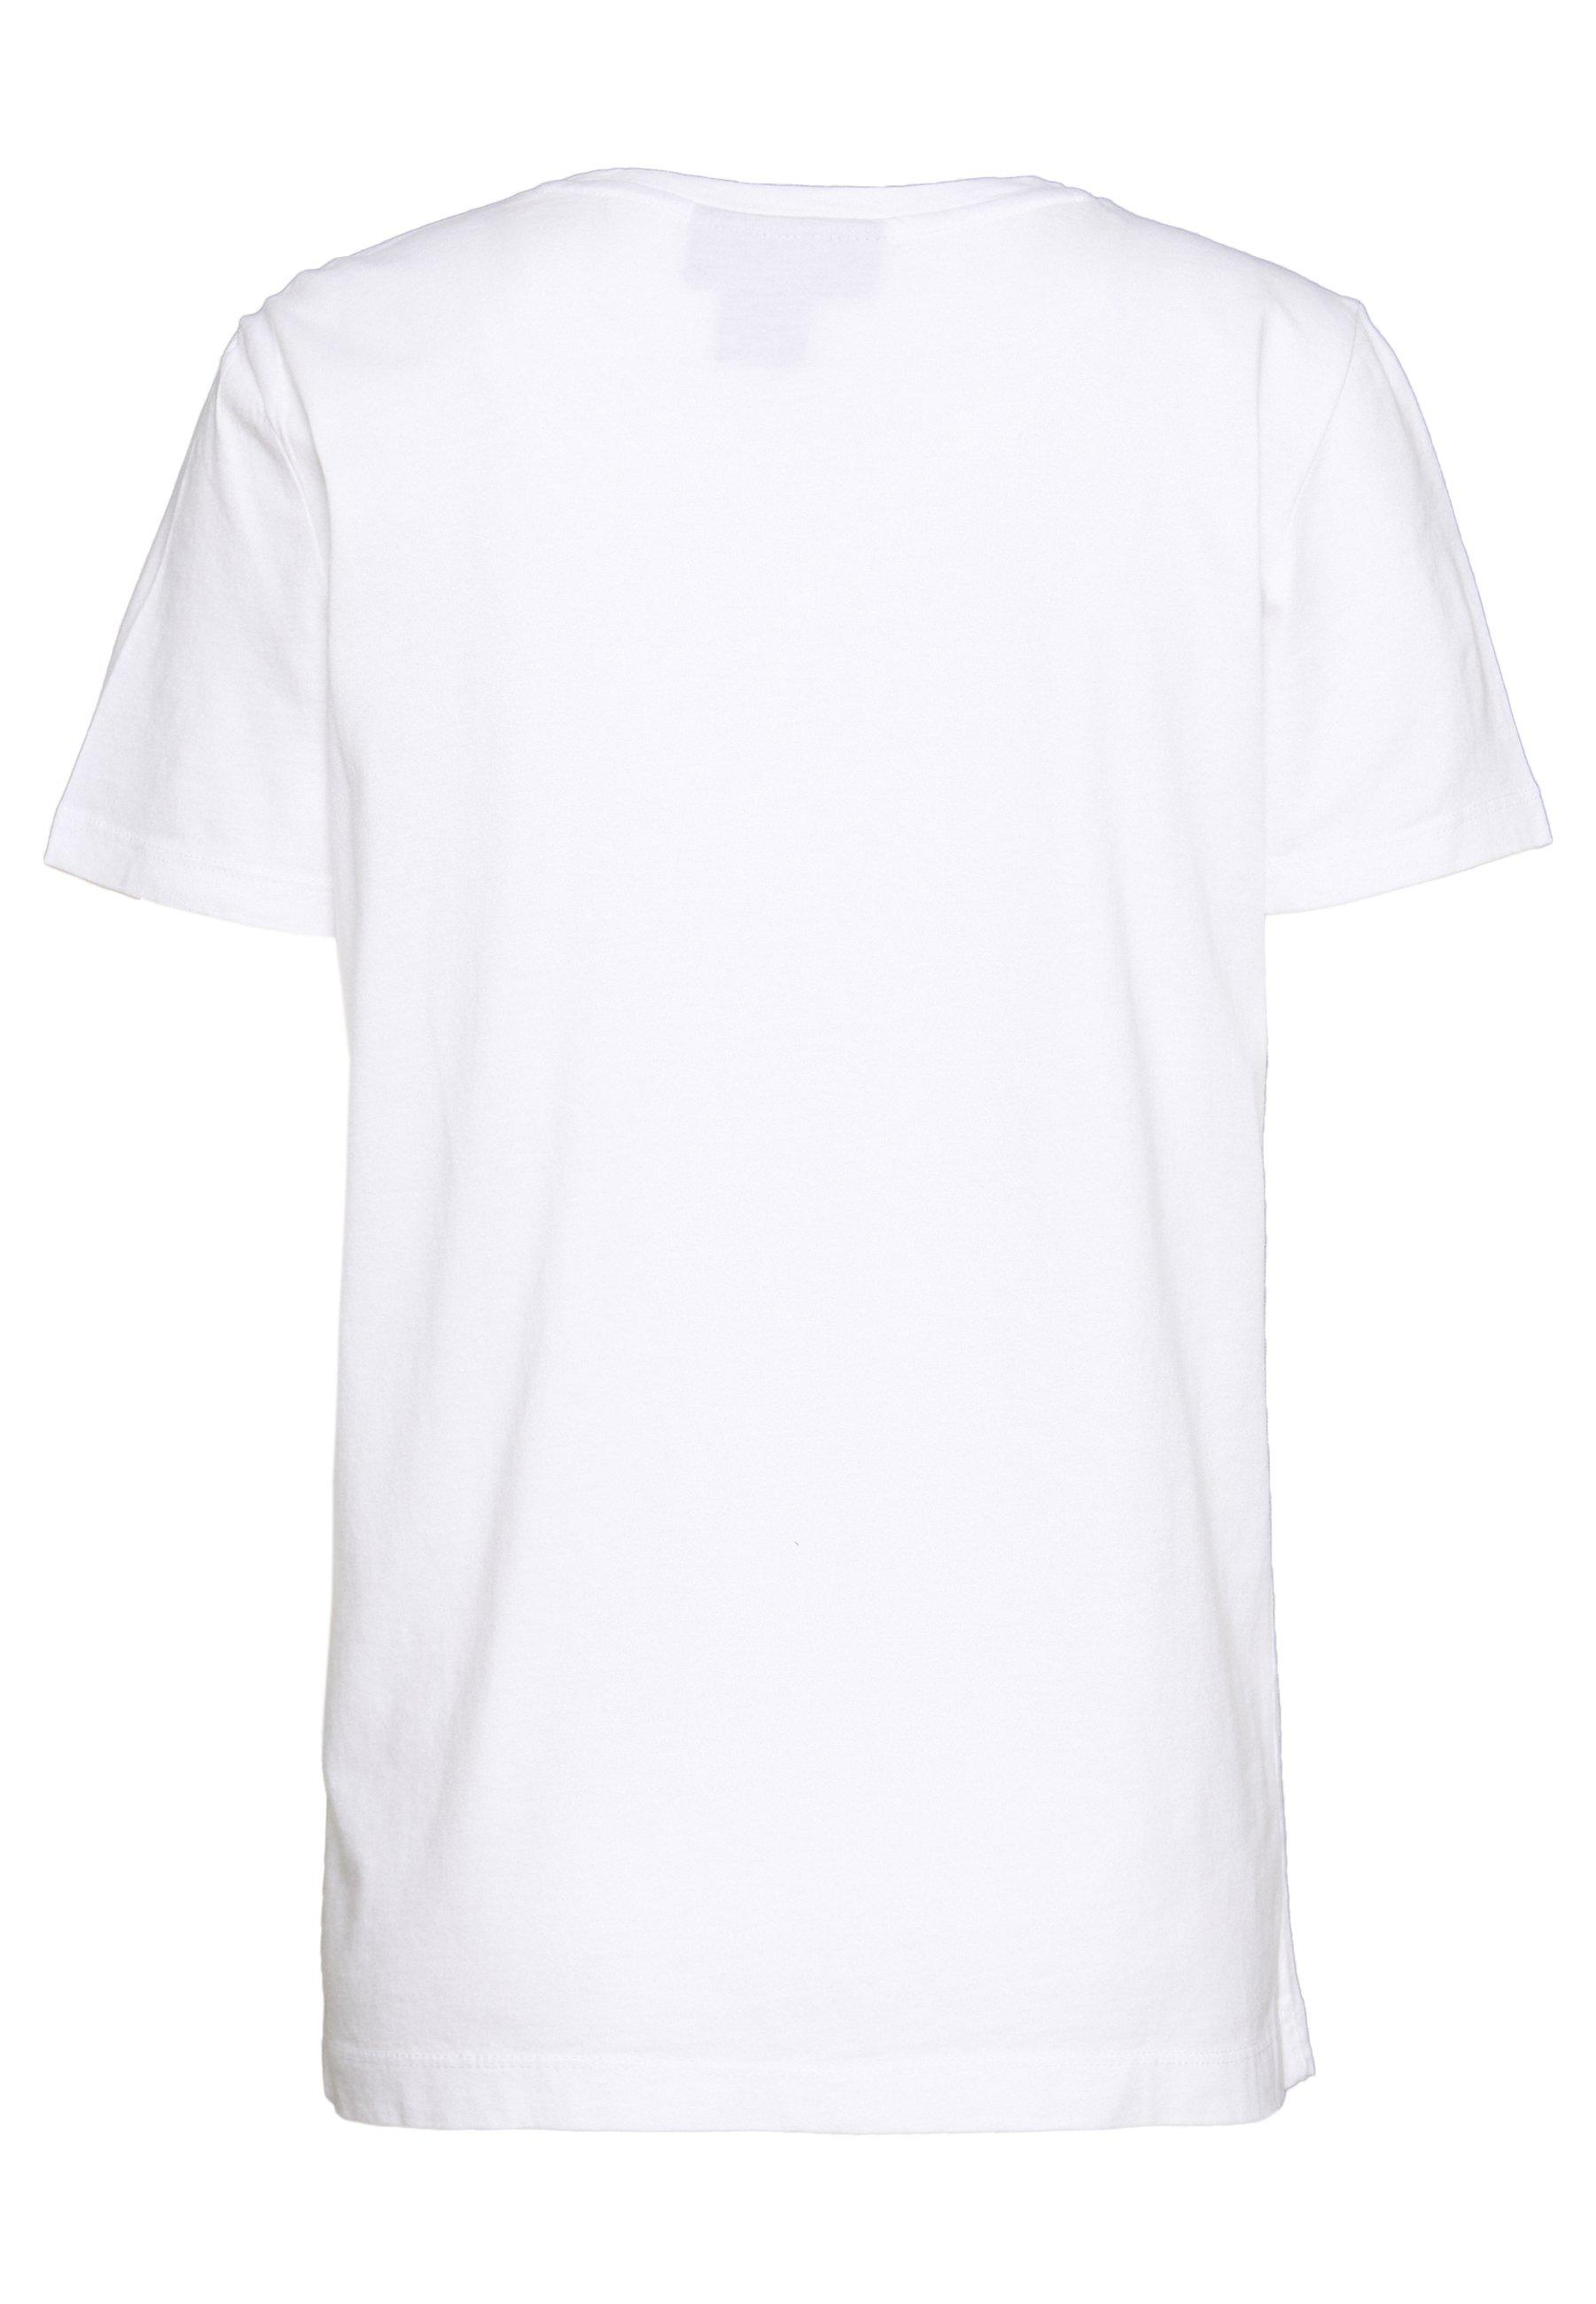 DKNY LOGO SEQUIN - T-shirt con stampa - white/black/magnolia